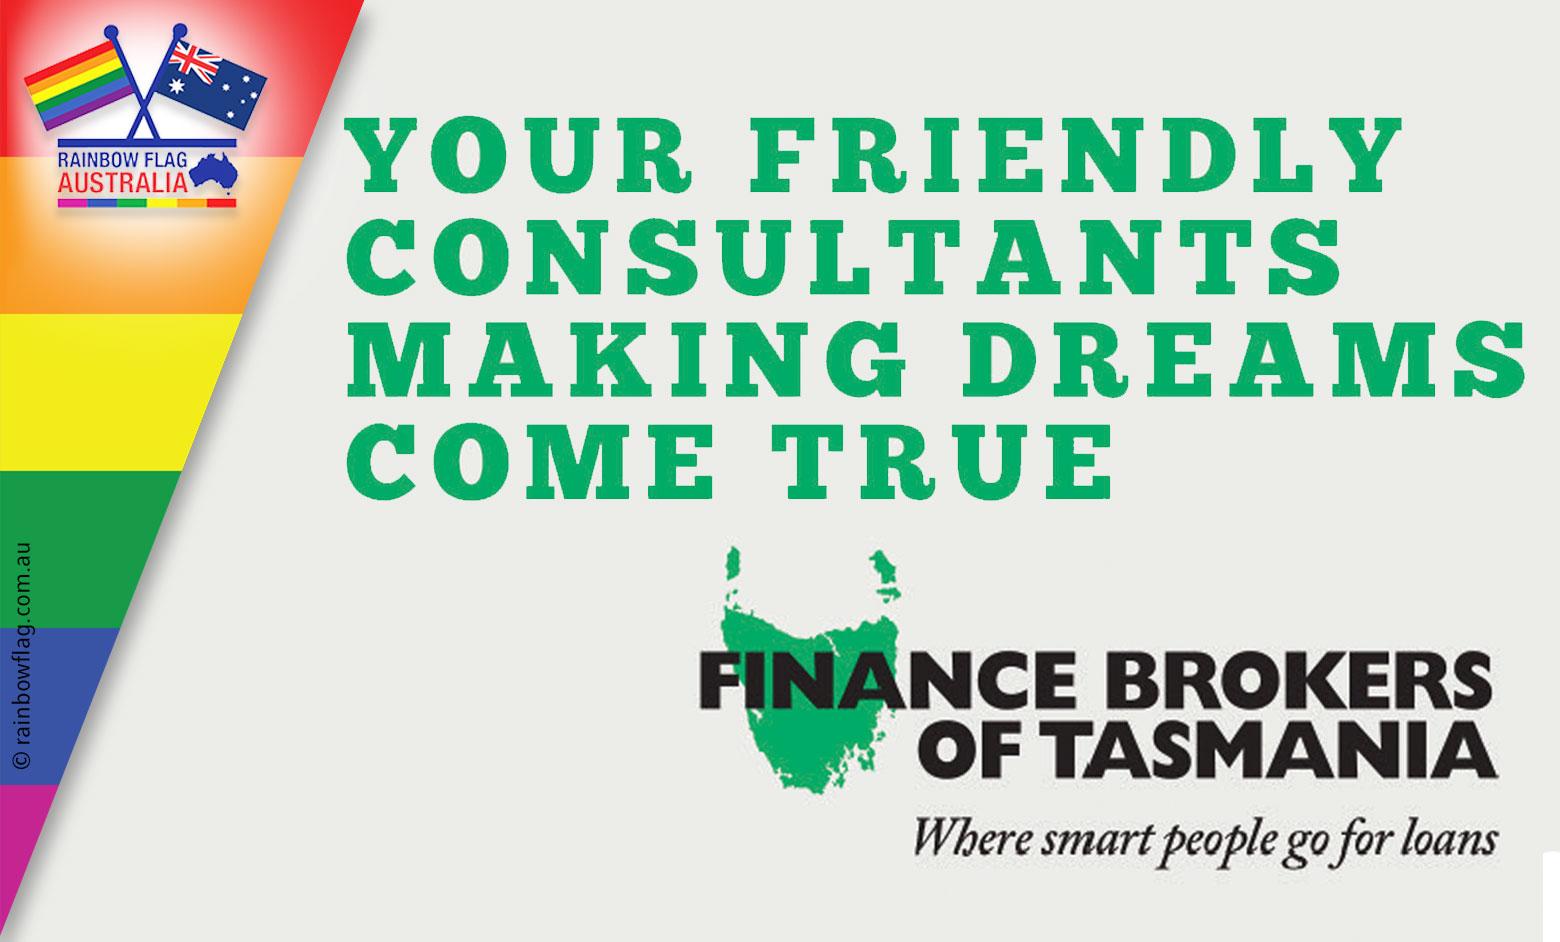 Finance Brokers of Tasmania